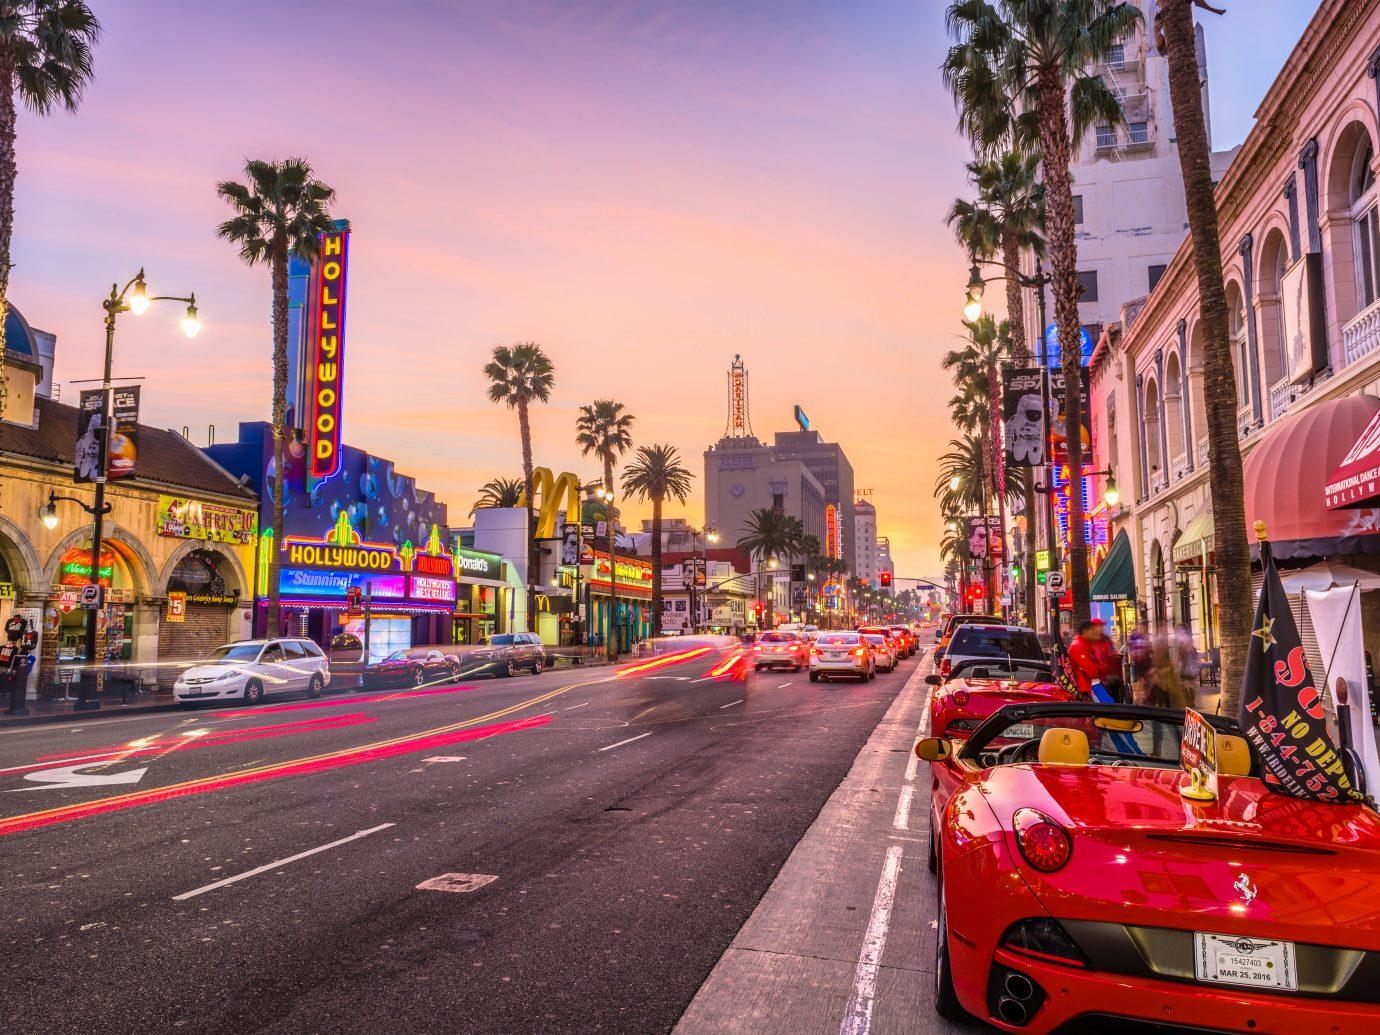 Traffic on Hollywood Boulevard at dusk